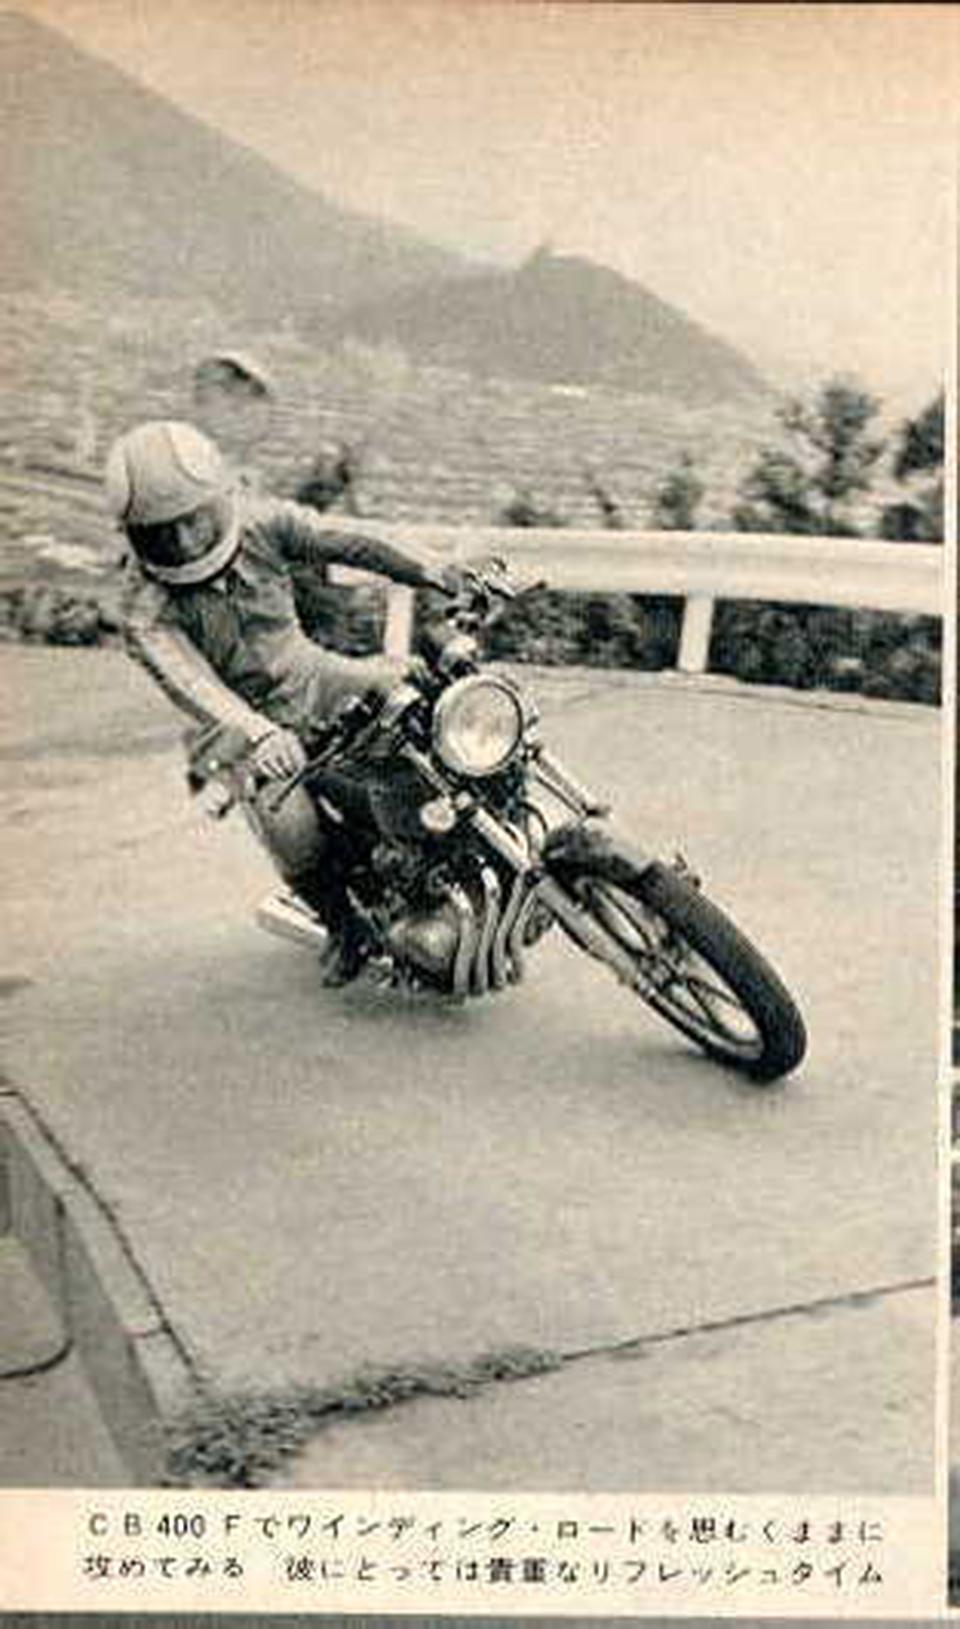 Young-Machine-1975-Honda-CB400F-1975-3